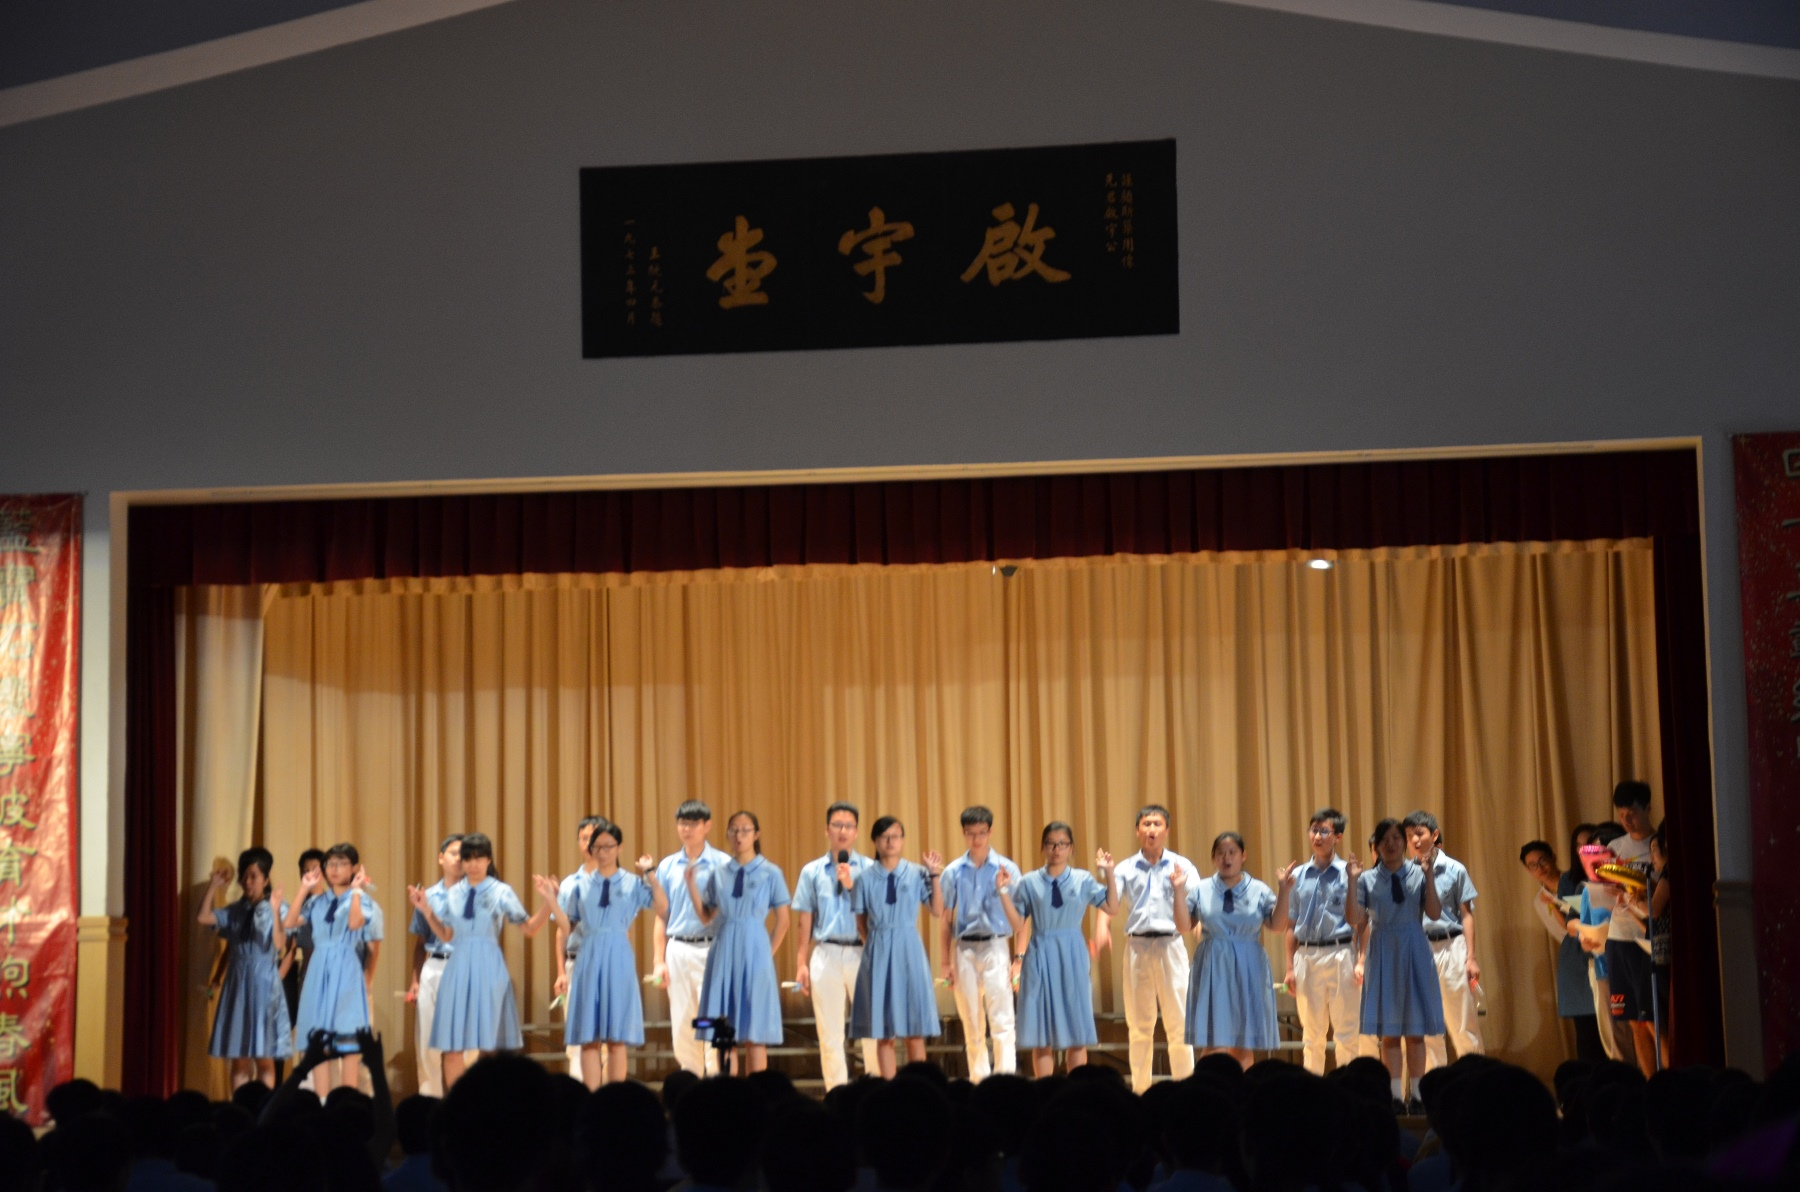 http://www.npc.edu.hk/sites/default/files/dsc_7443.jpg